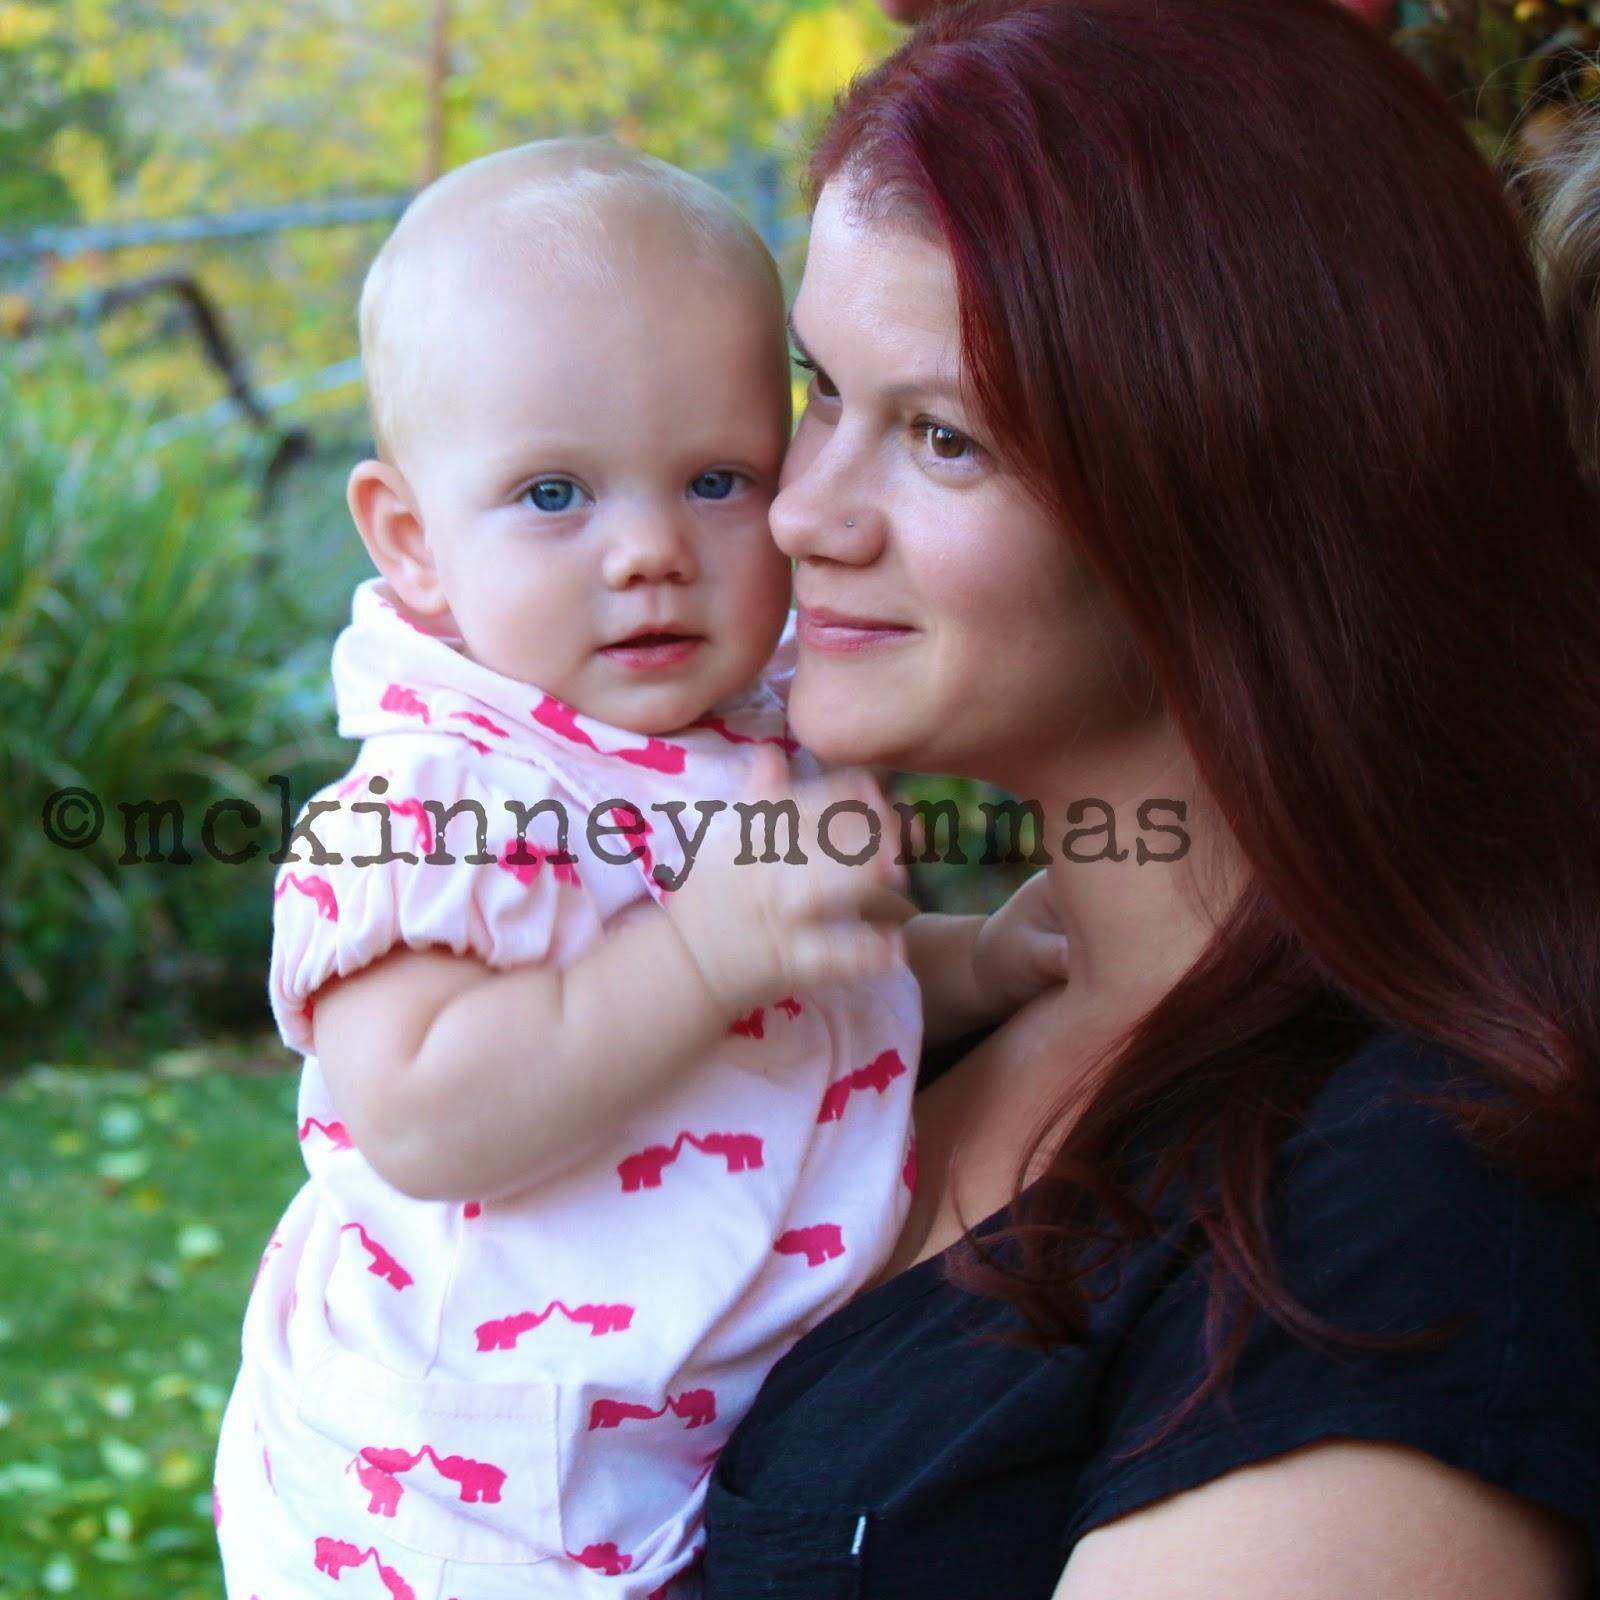 McKinney Mommas Hair Baby